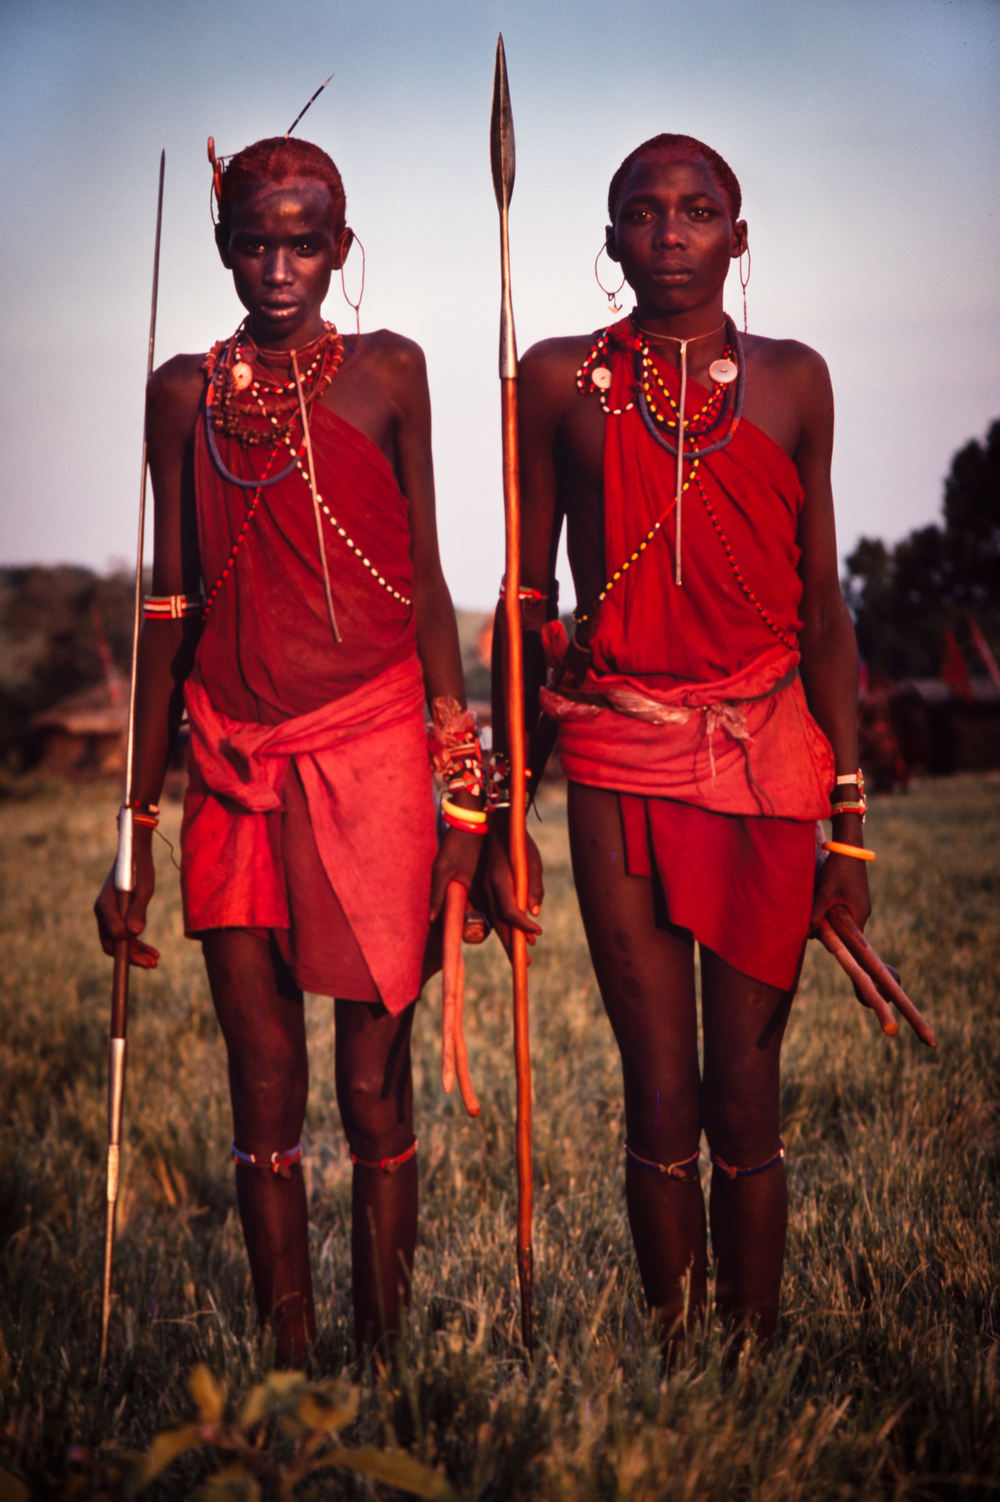 Africa-083-67.jpg